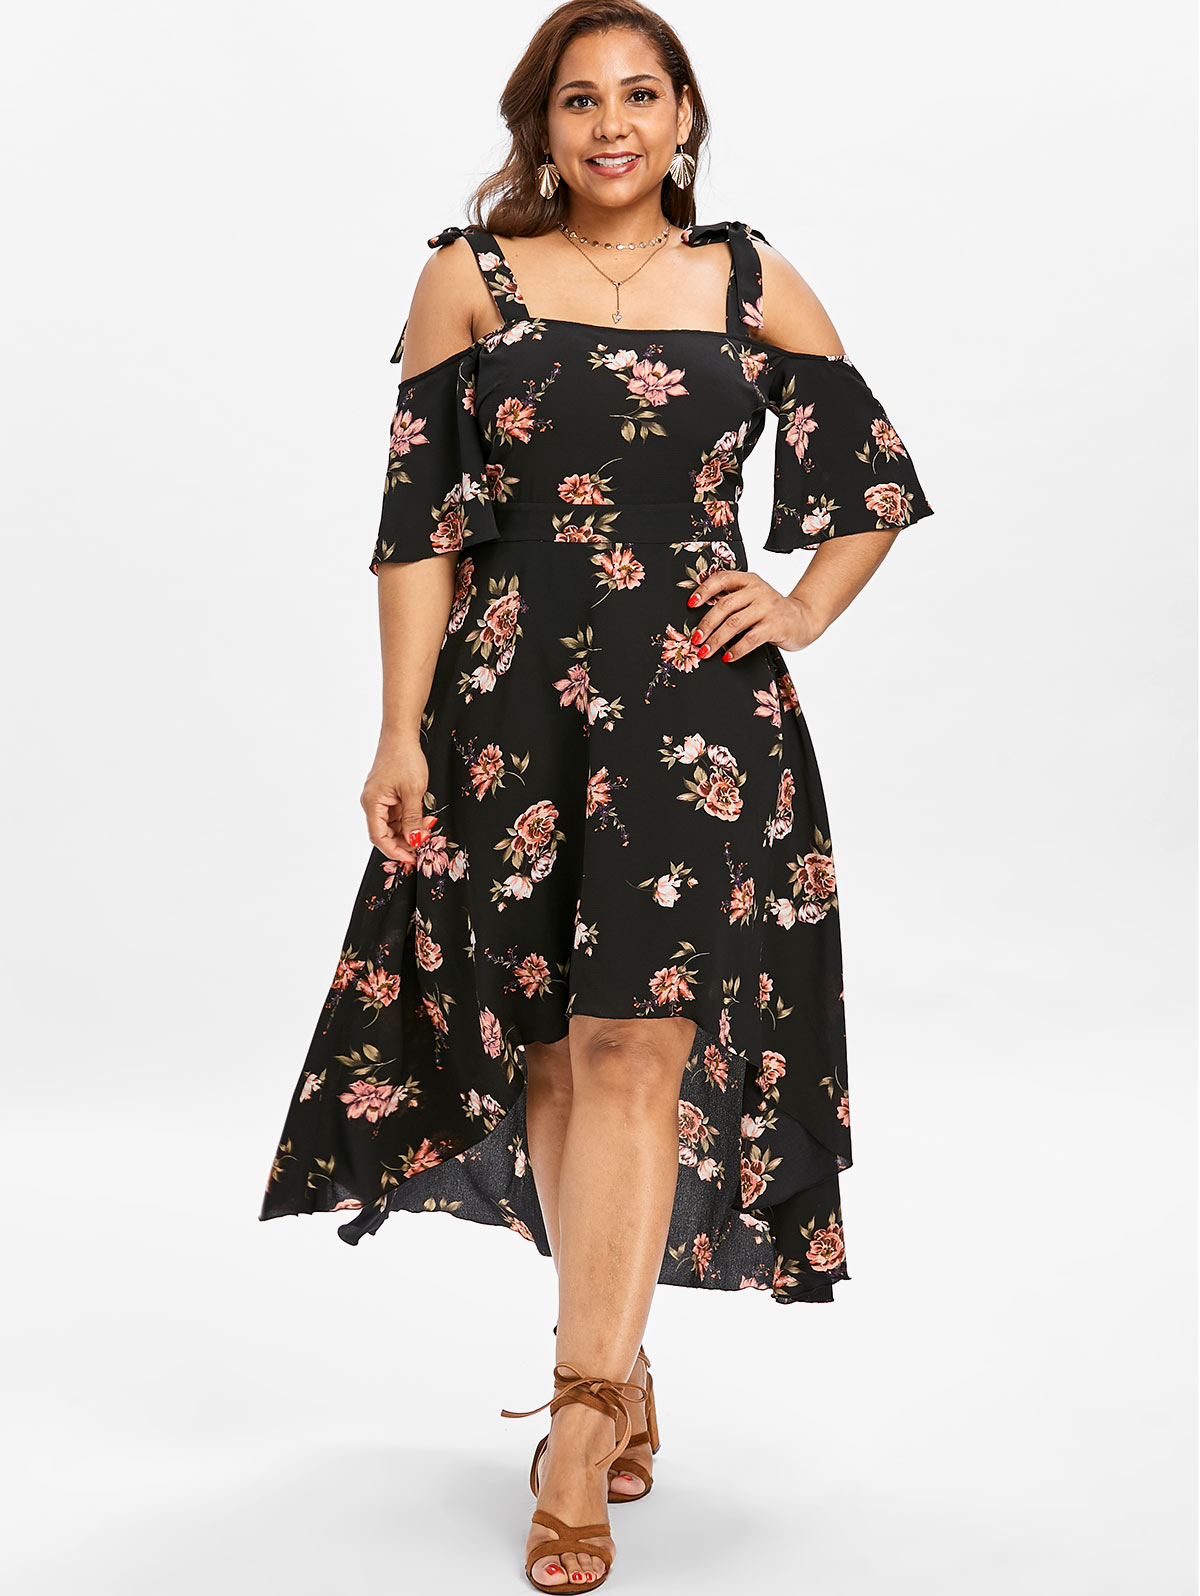 b3bd37f601 Gamiss Women Casual Boho Dress Plus Size 5XL Open Shoulder Floral Print  Flowy Dress Summer Half Sleeves Asymmetrical Vestidos